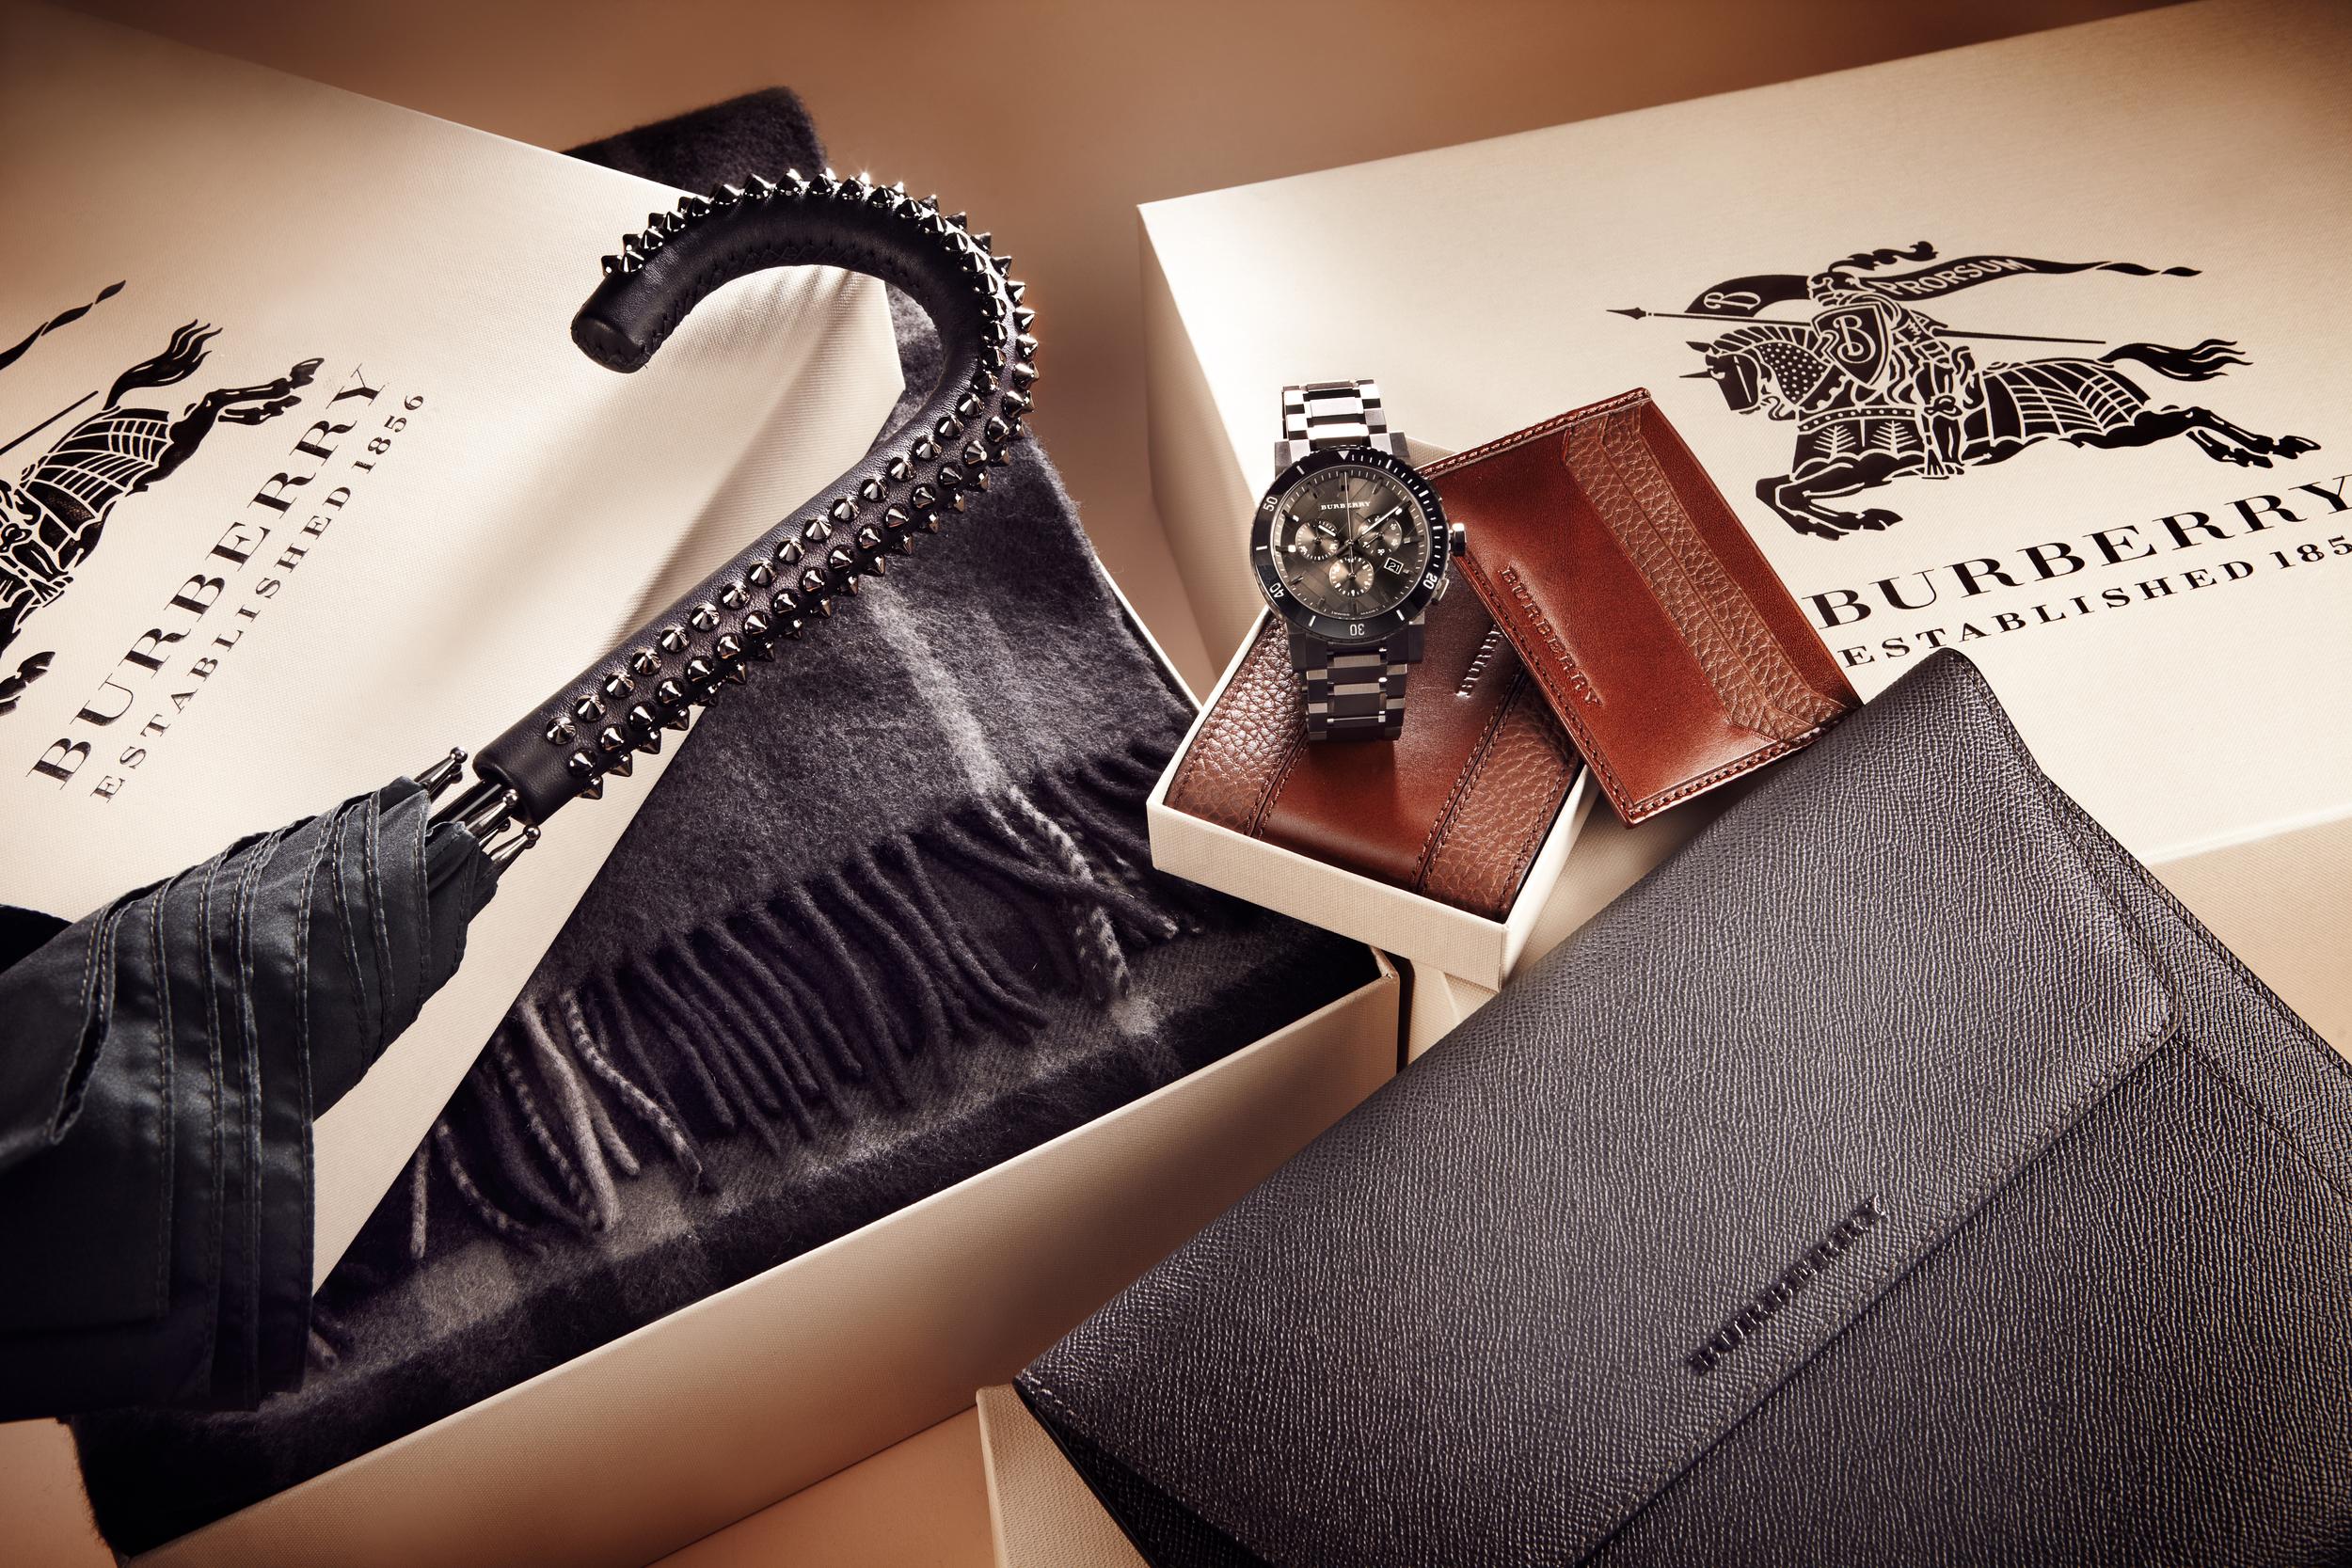 Burberry_Gifts_Mens_Slideshow_167271330_EDITORIAL+001.jpg